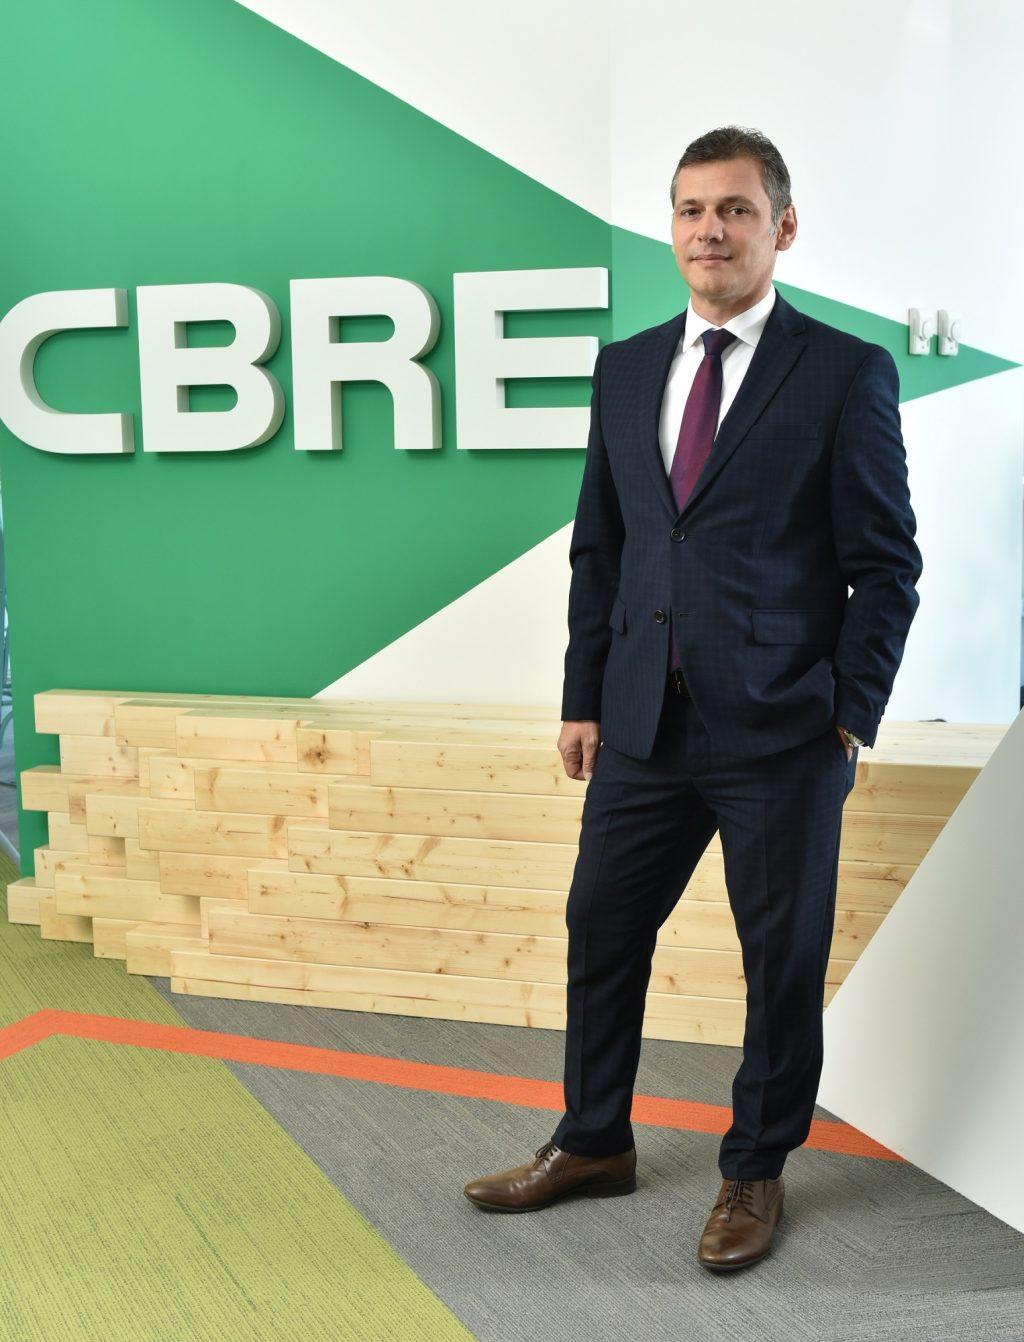 CBRE face Management de Proiect pentru Revera Medical City